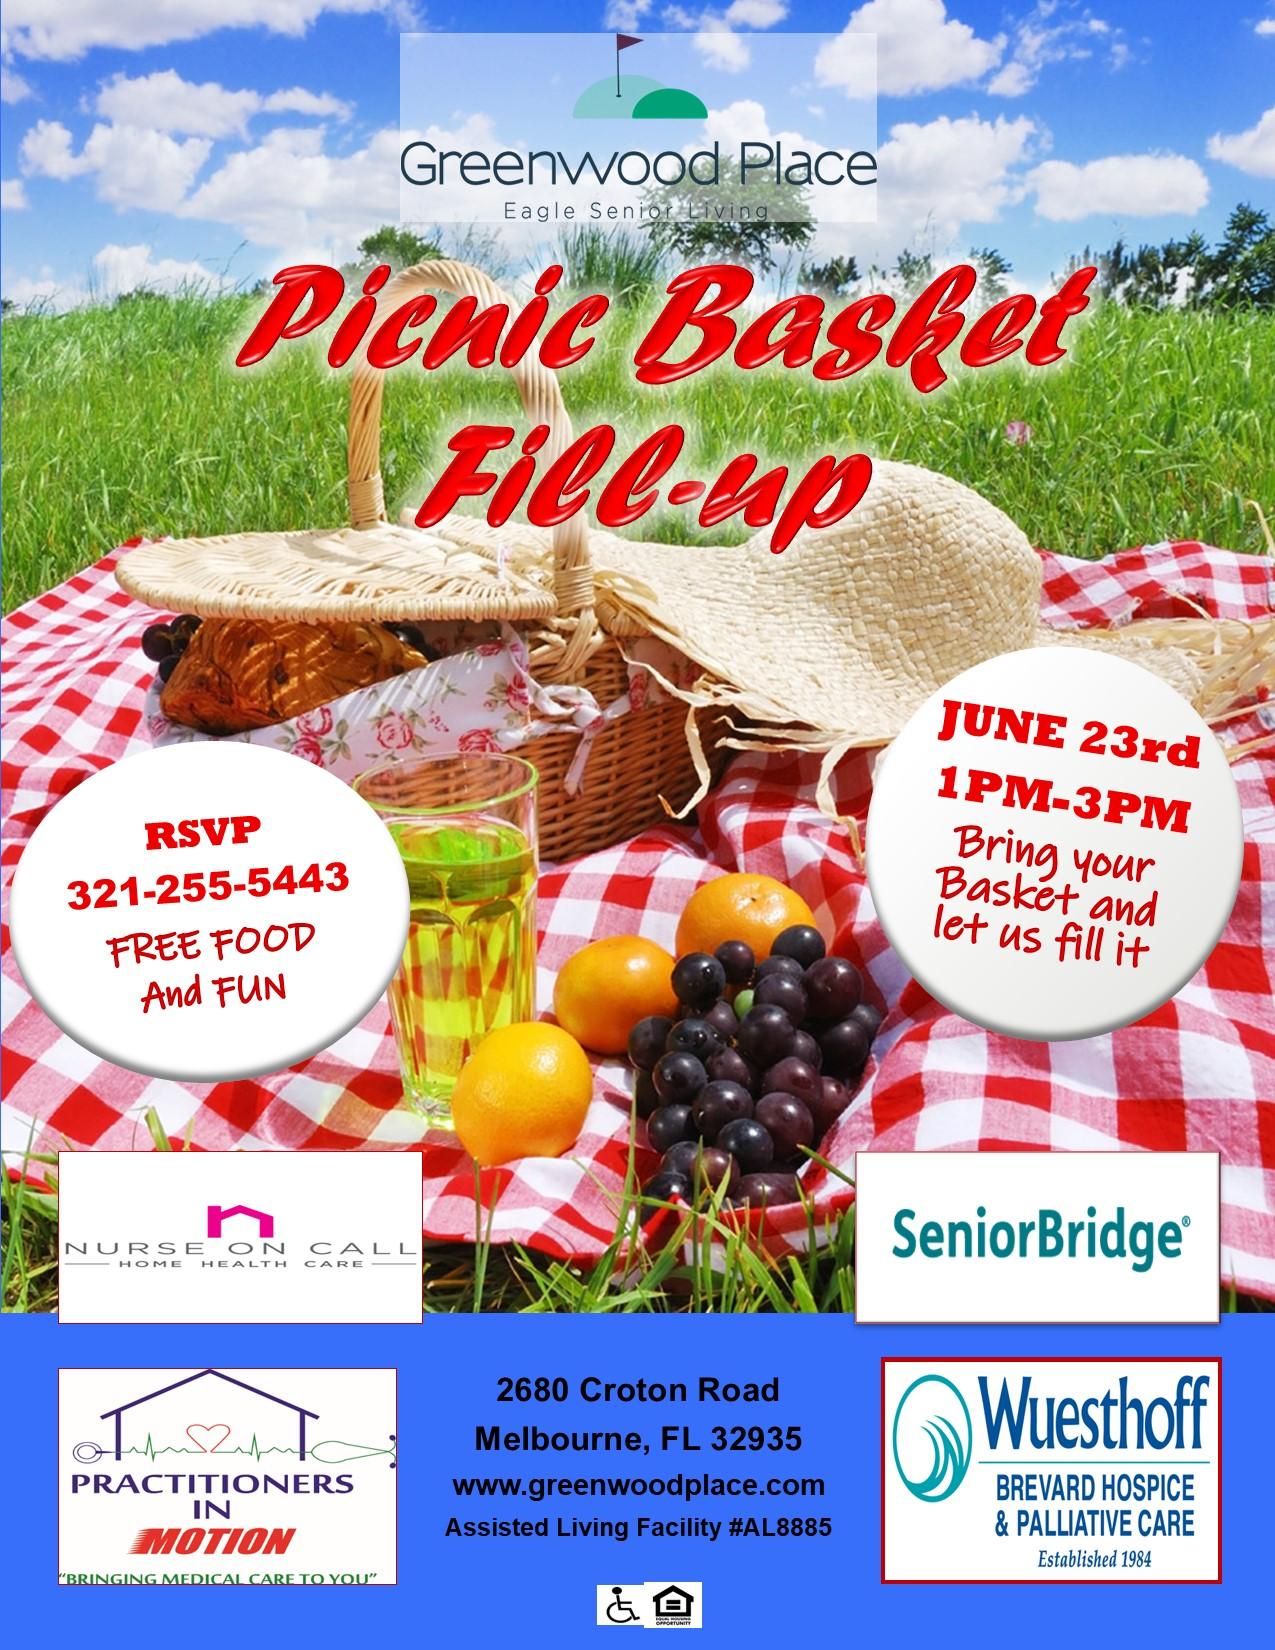 Picnic Basket Fill-up at Greenwood Place